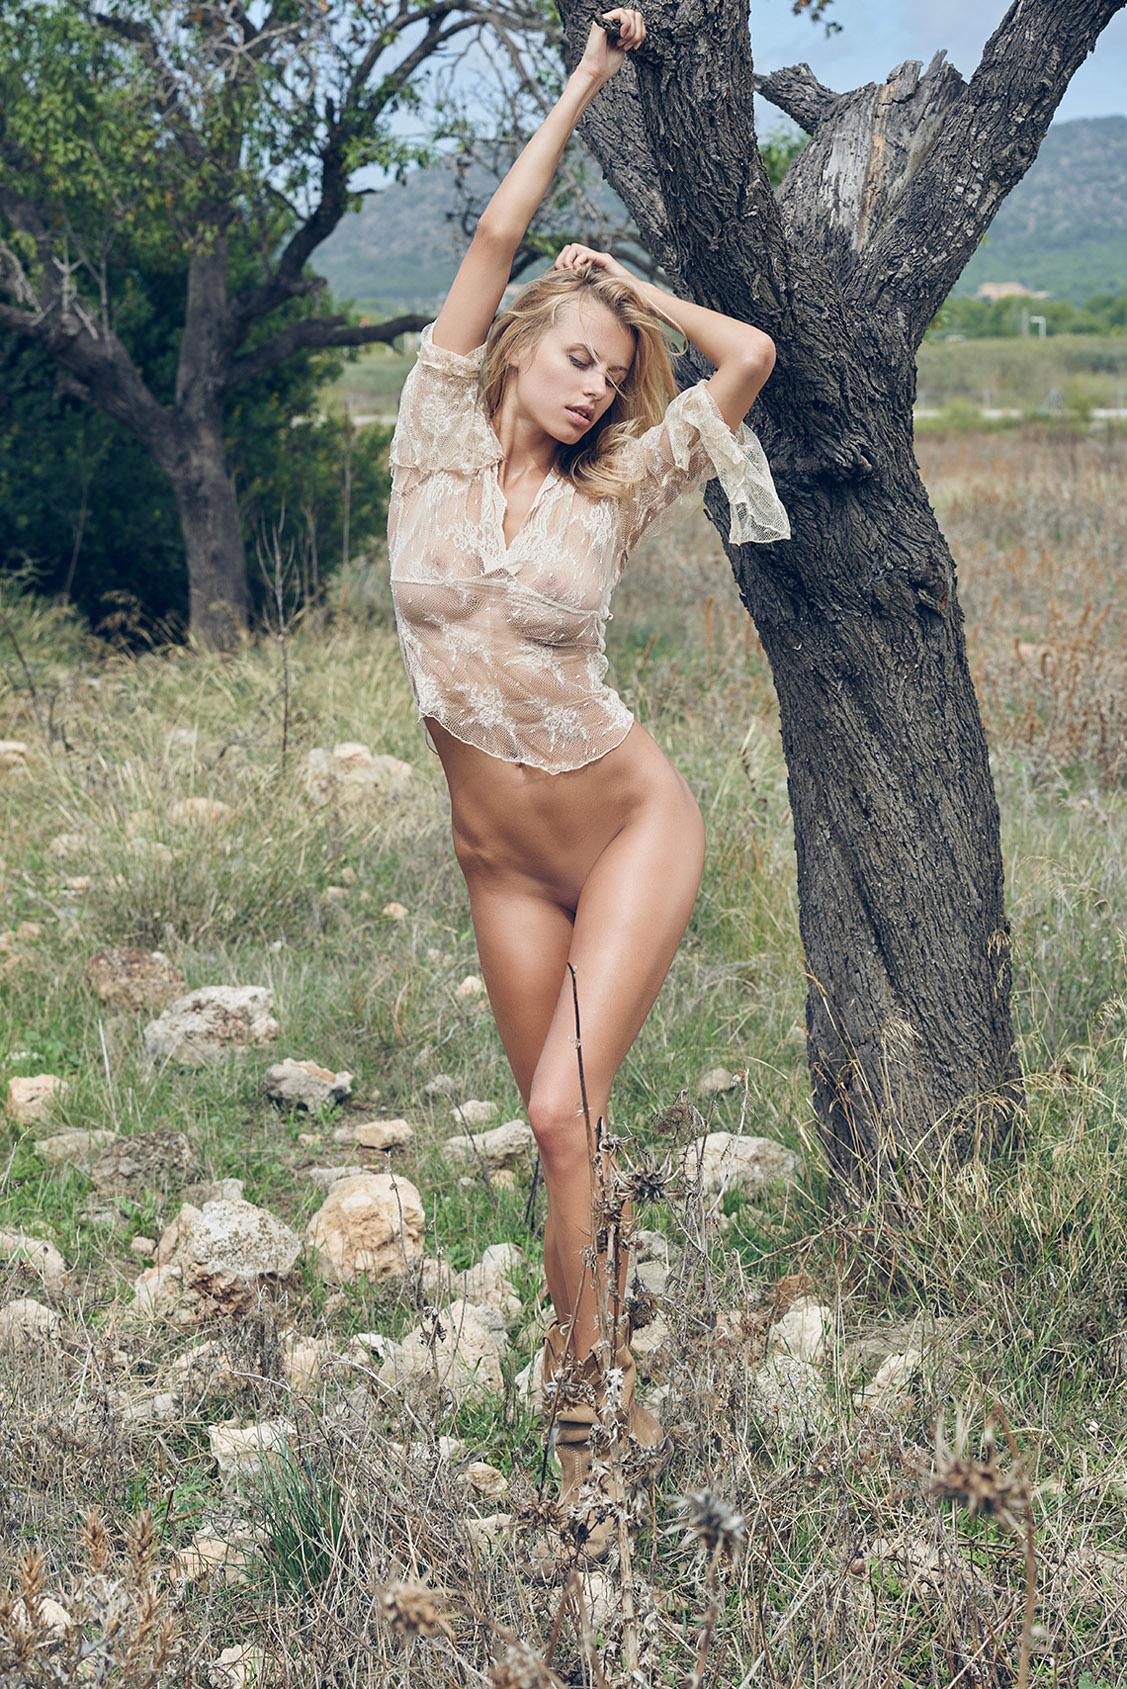 обнаженная Ольга де Мар на природе / Olga De Mar by Stefan Imielski